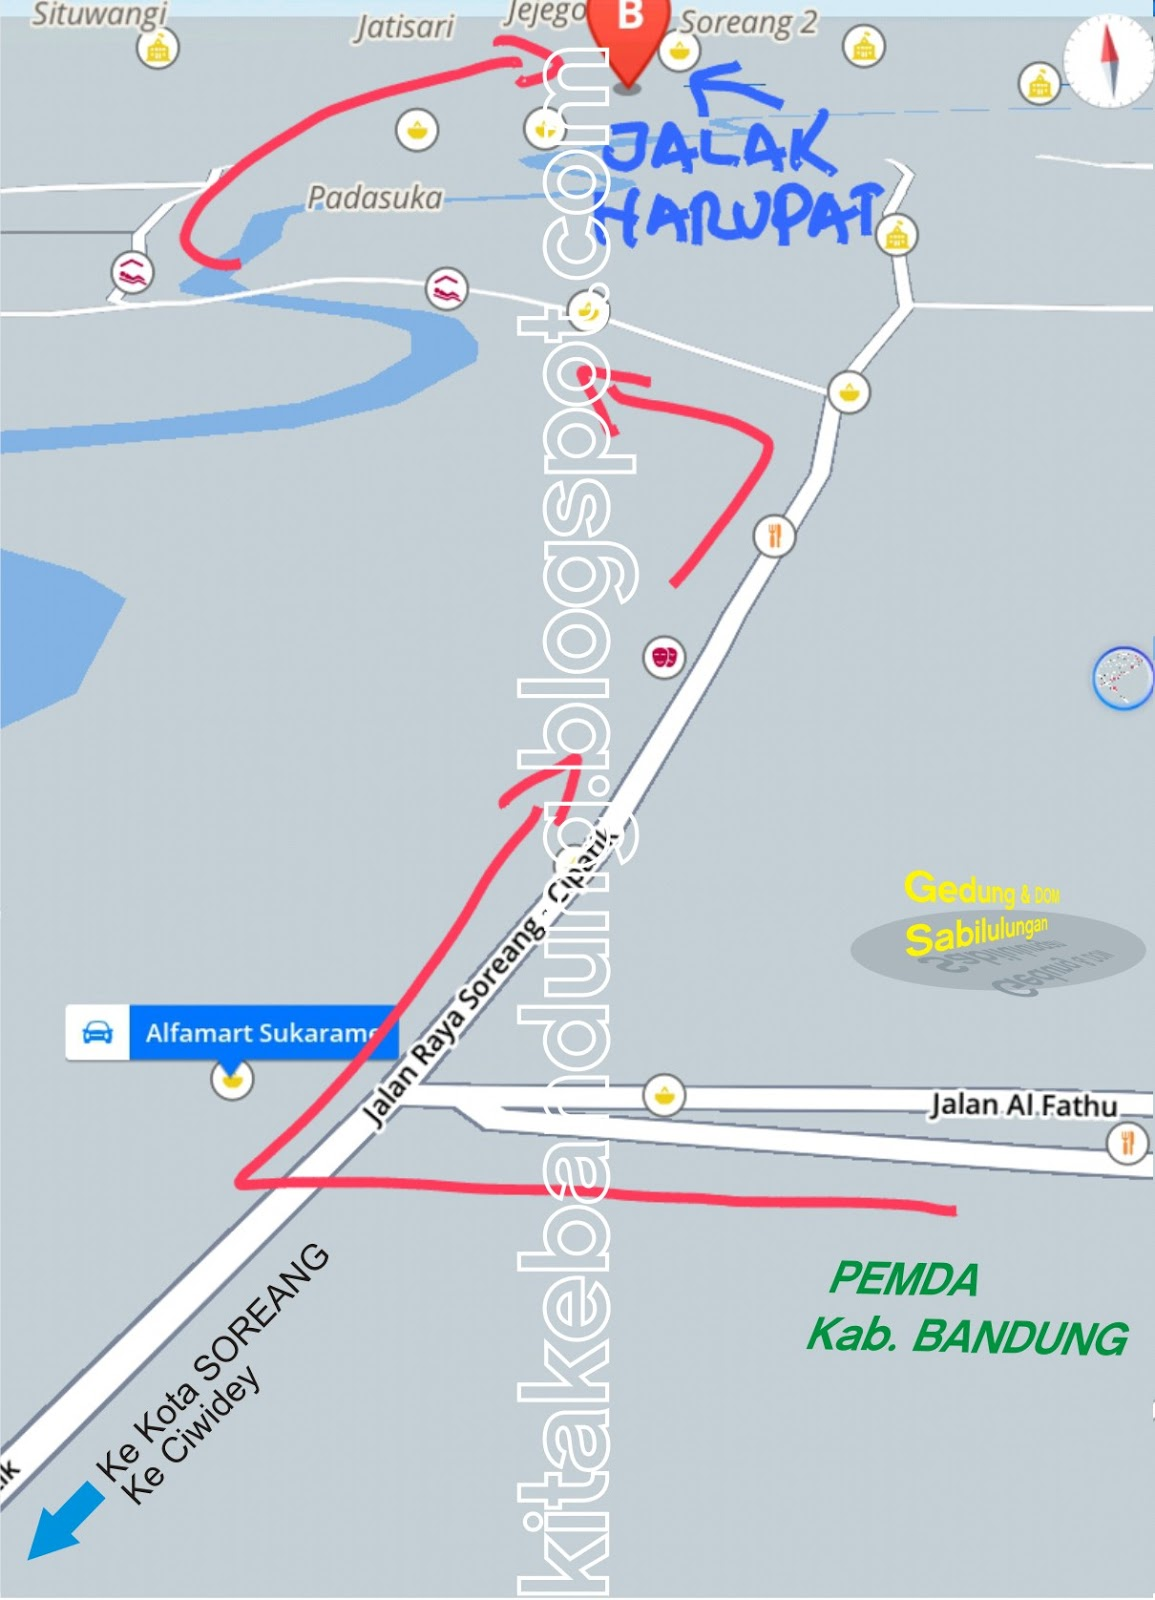 Peta Rute Jalan Bandung Stadion Jalak Harupat Soreang Terminal Leuwi